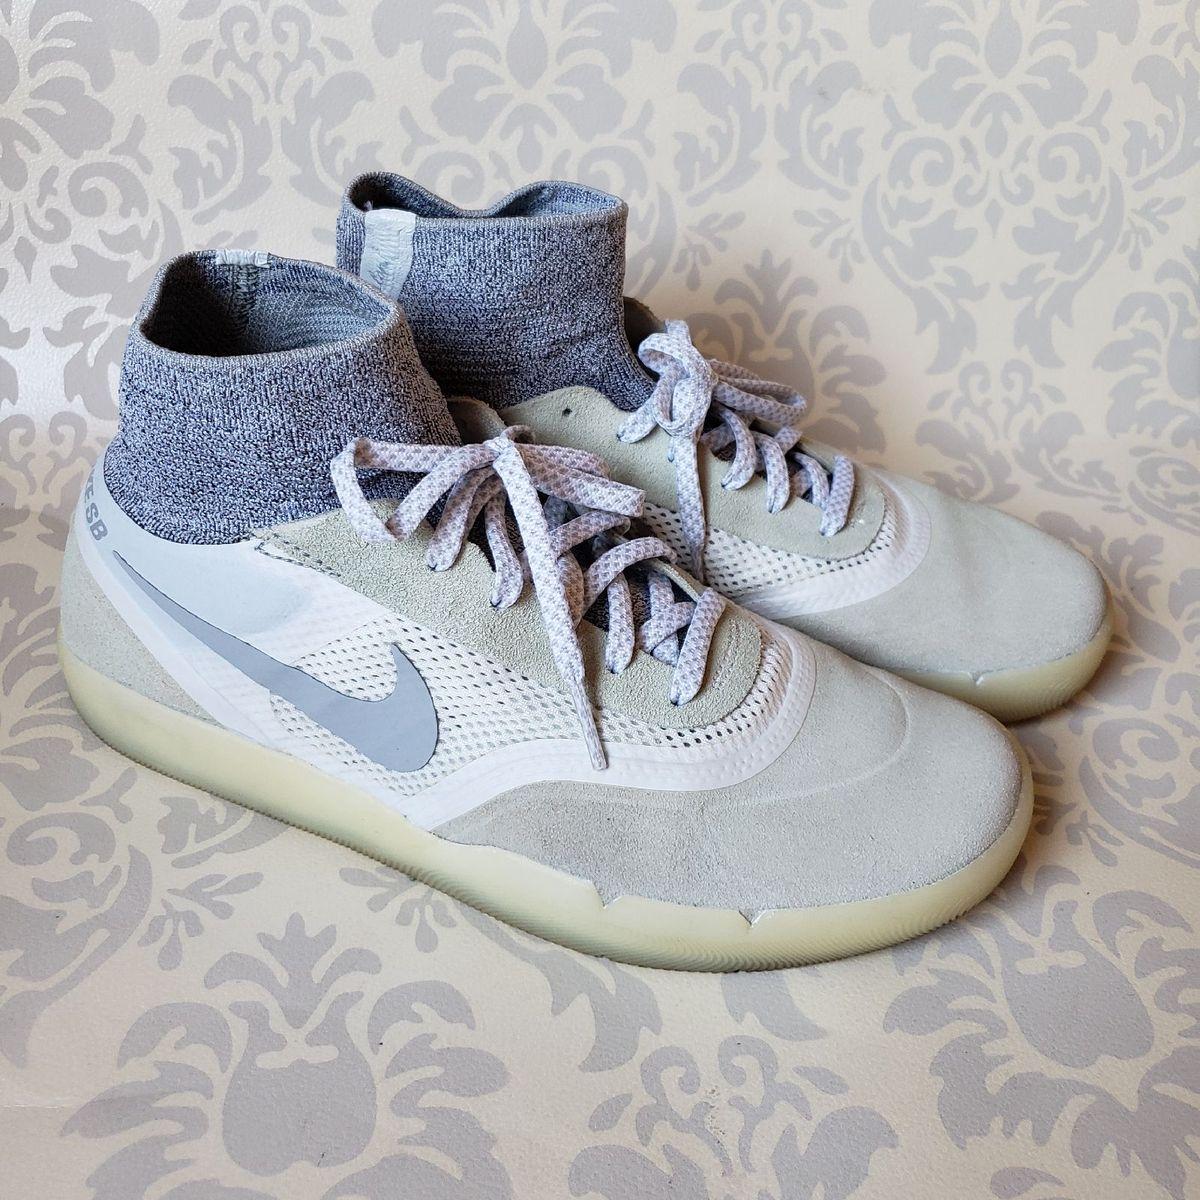 Agarrar partido Democrático Plasticidad  Nike Sb Koston 3 Hyperfeel | Tênis Masculino Nike Usado 42359755 | enjoei